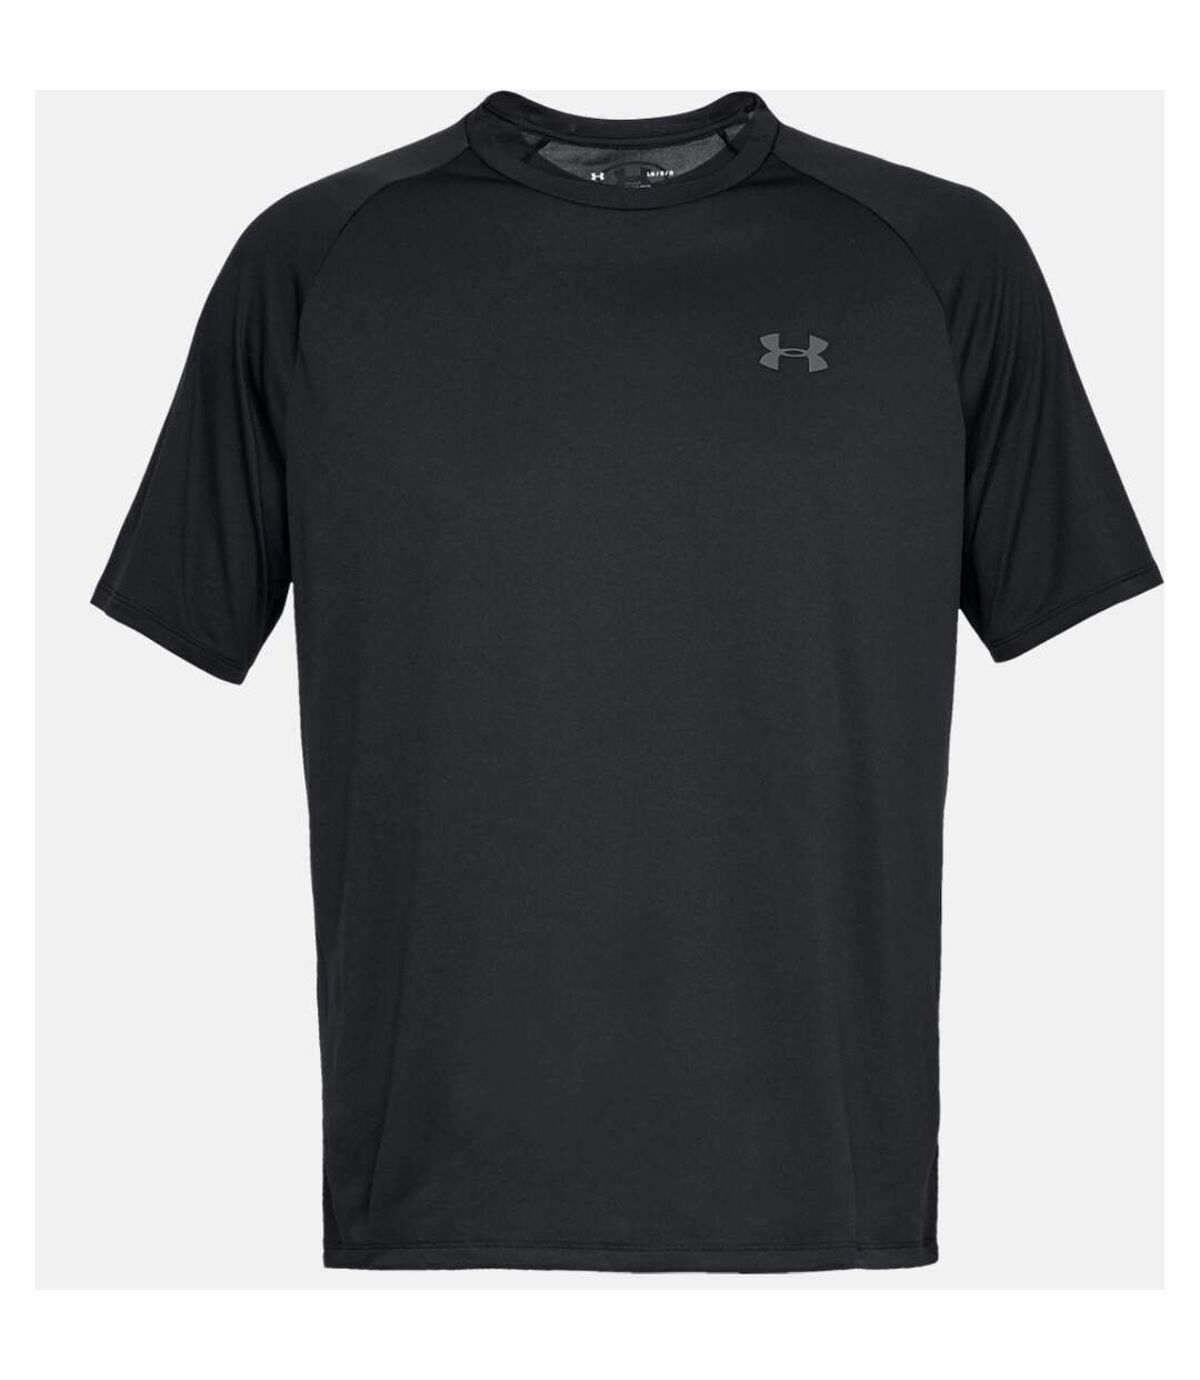 Under Armour Mens Tech T-Shirt (Black/Graphite) - UTRW7749